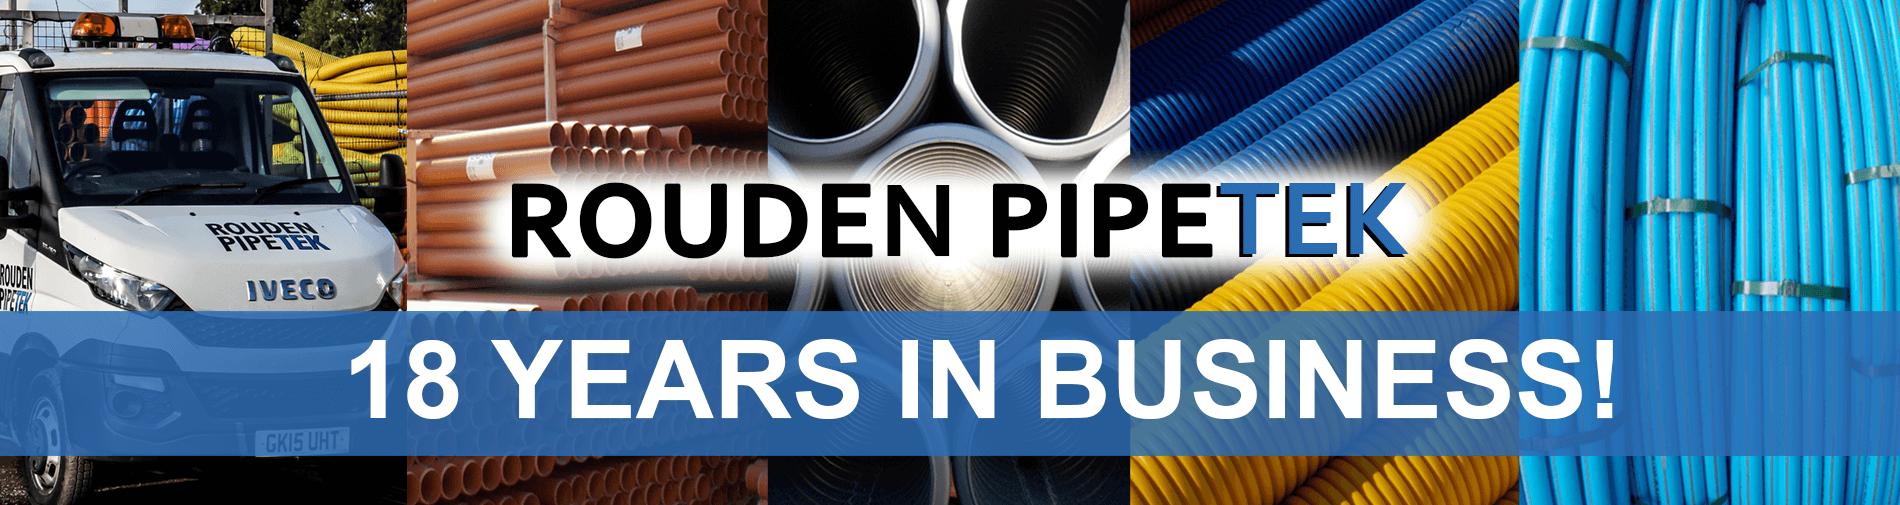 Rouden Pipetek- 18 Years in Business!